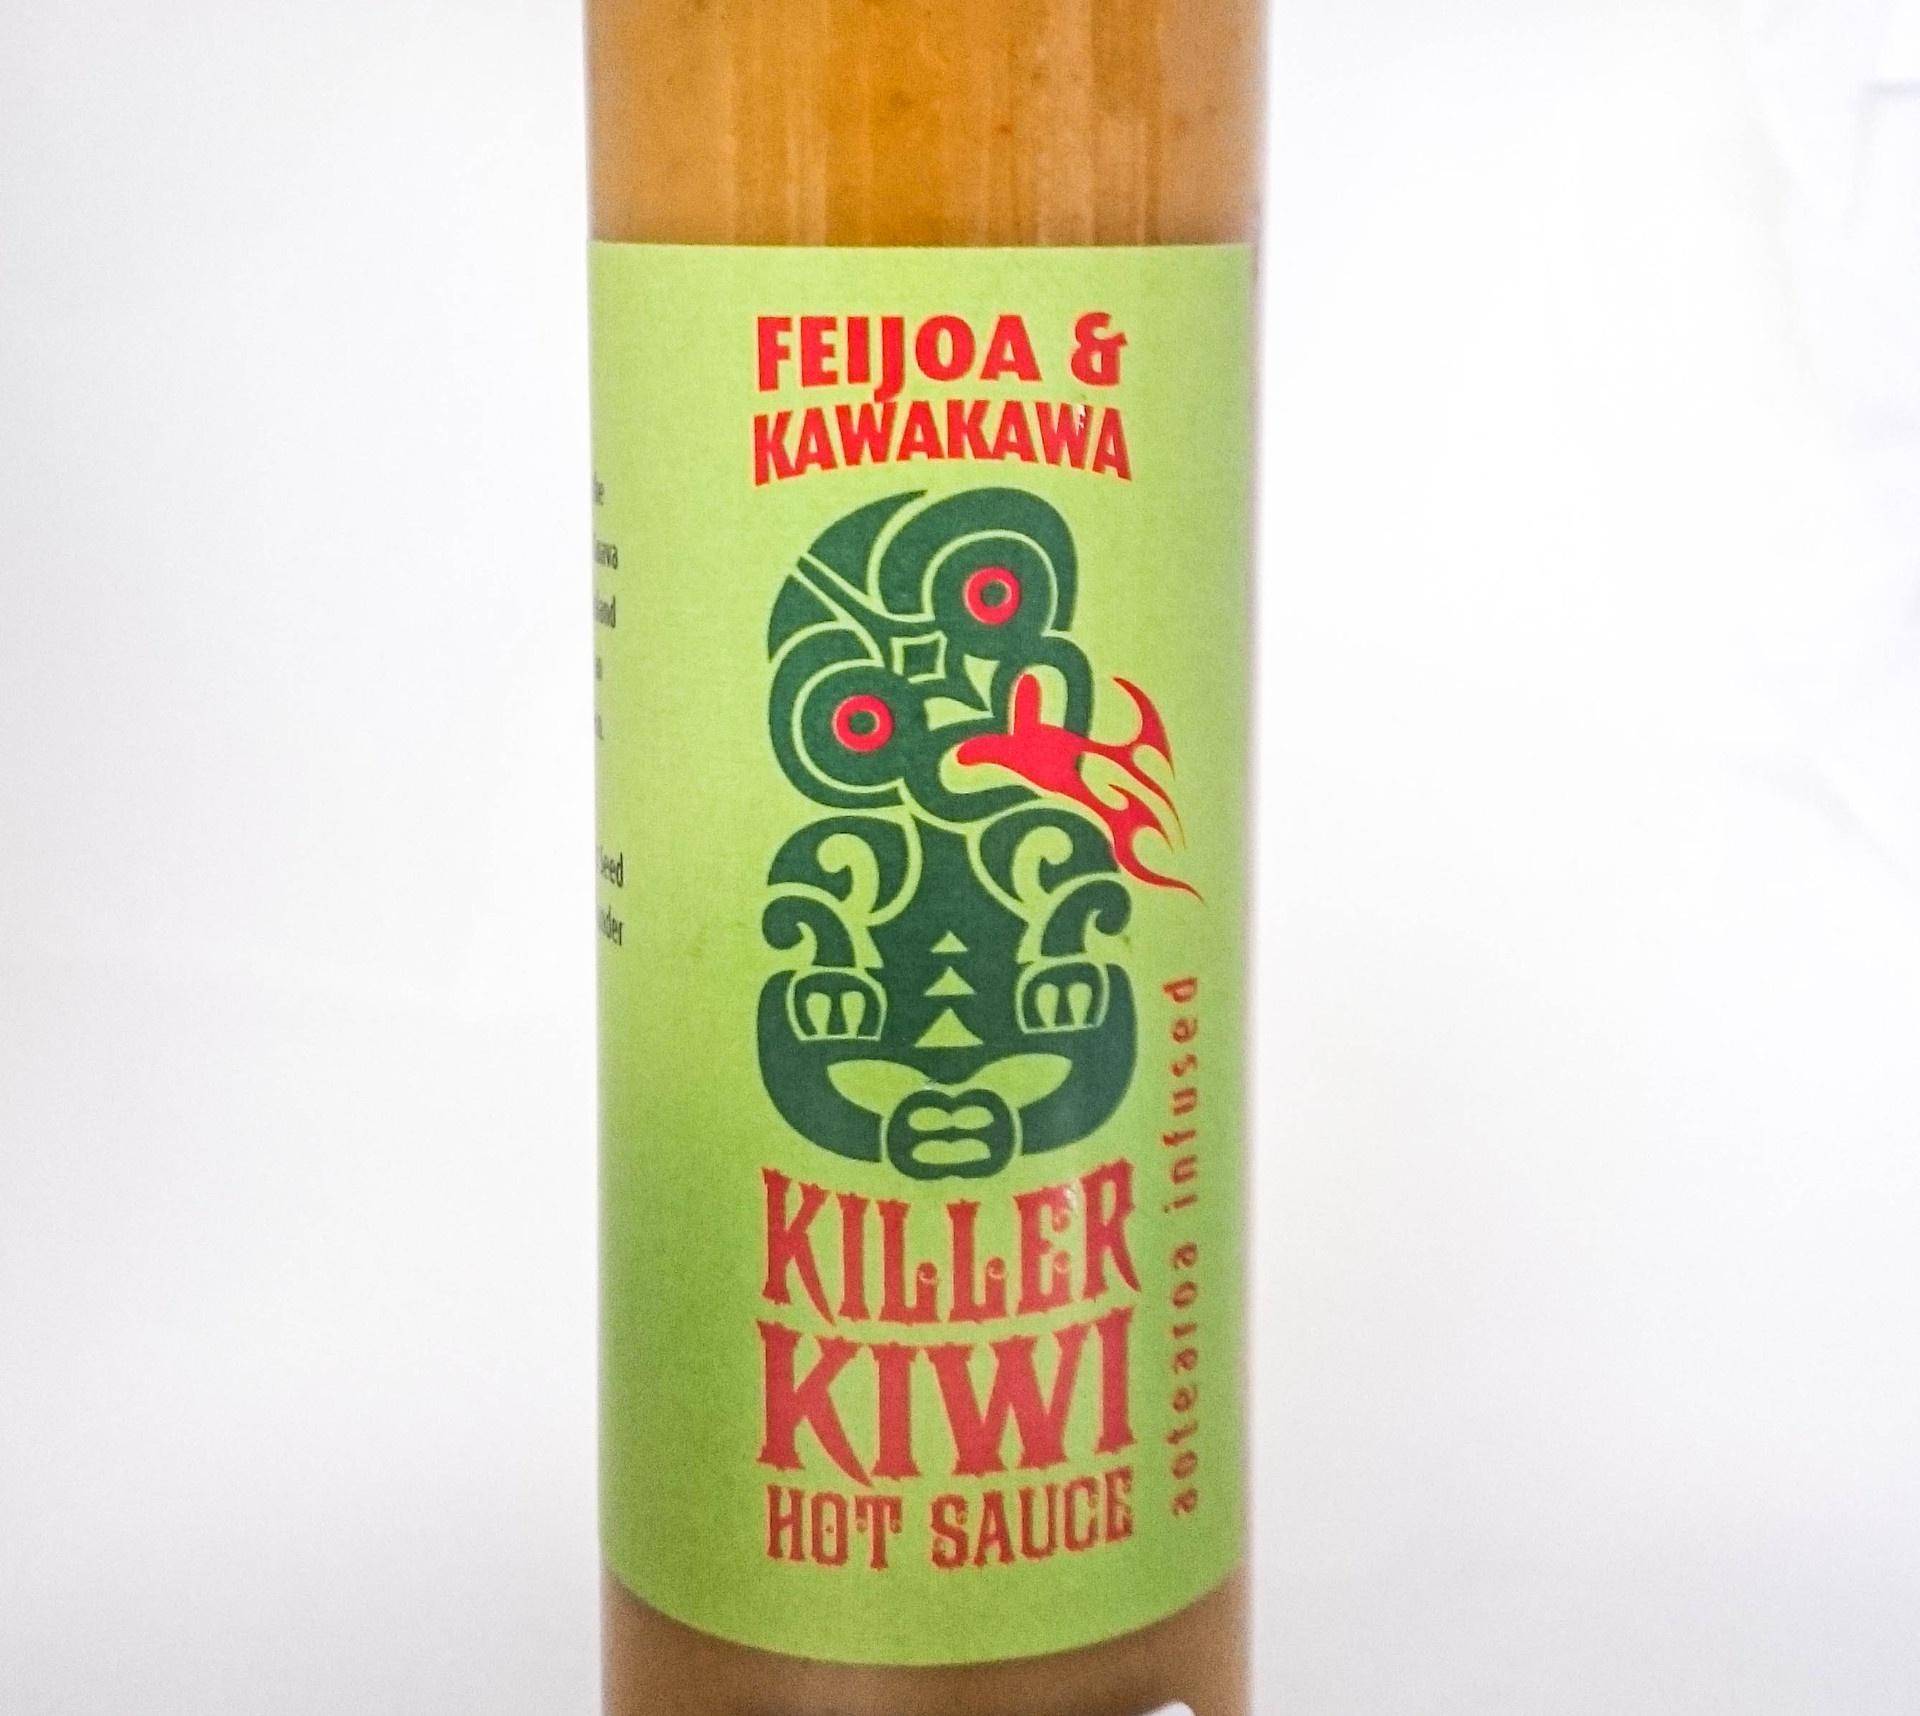 Killer Kiwi Hot Sauce